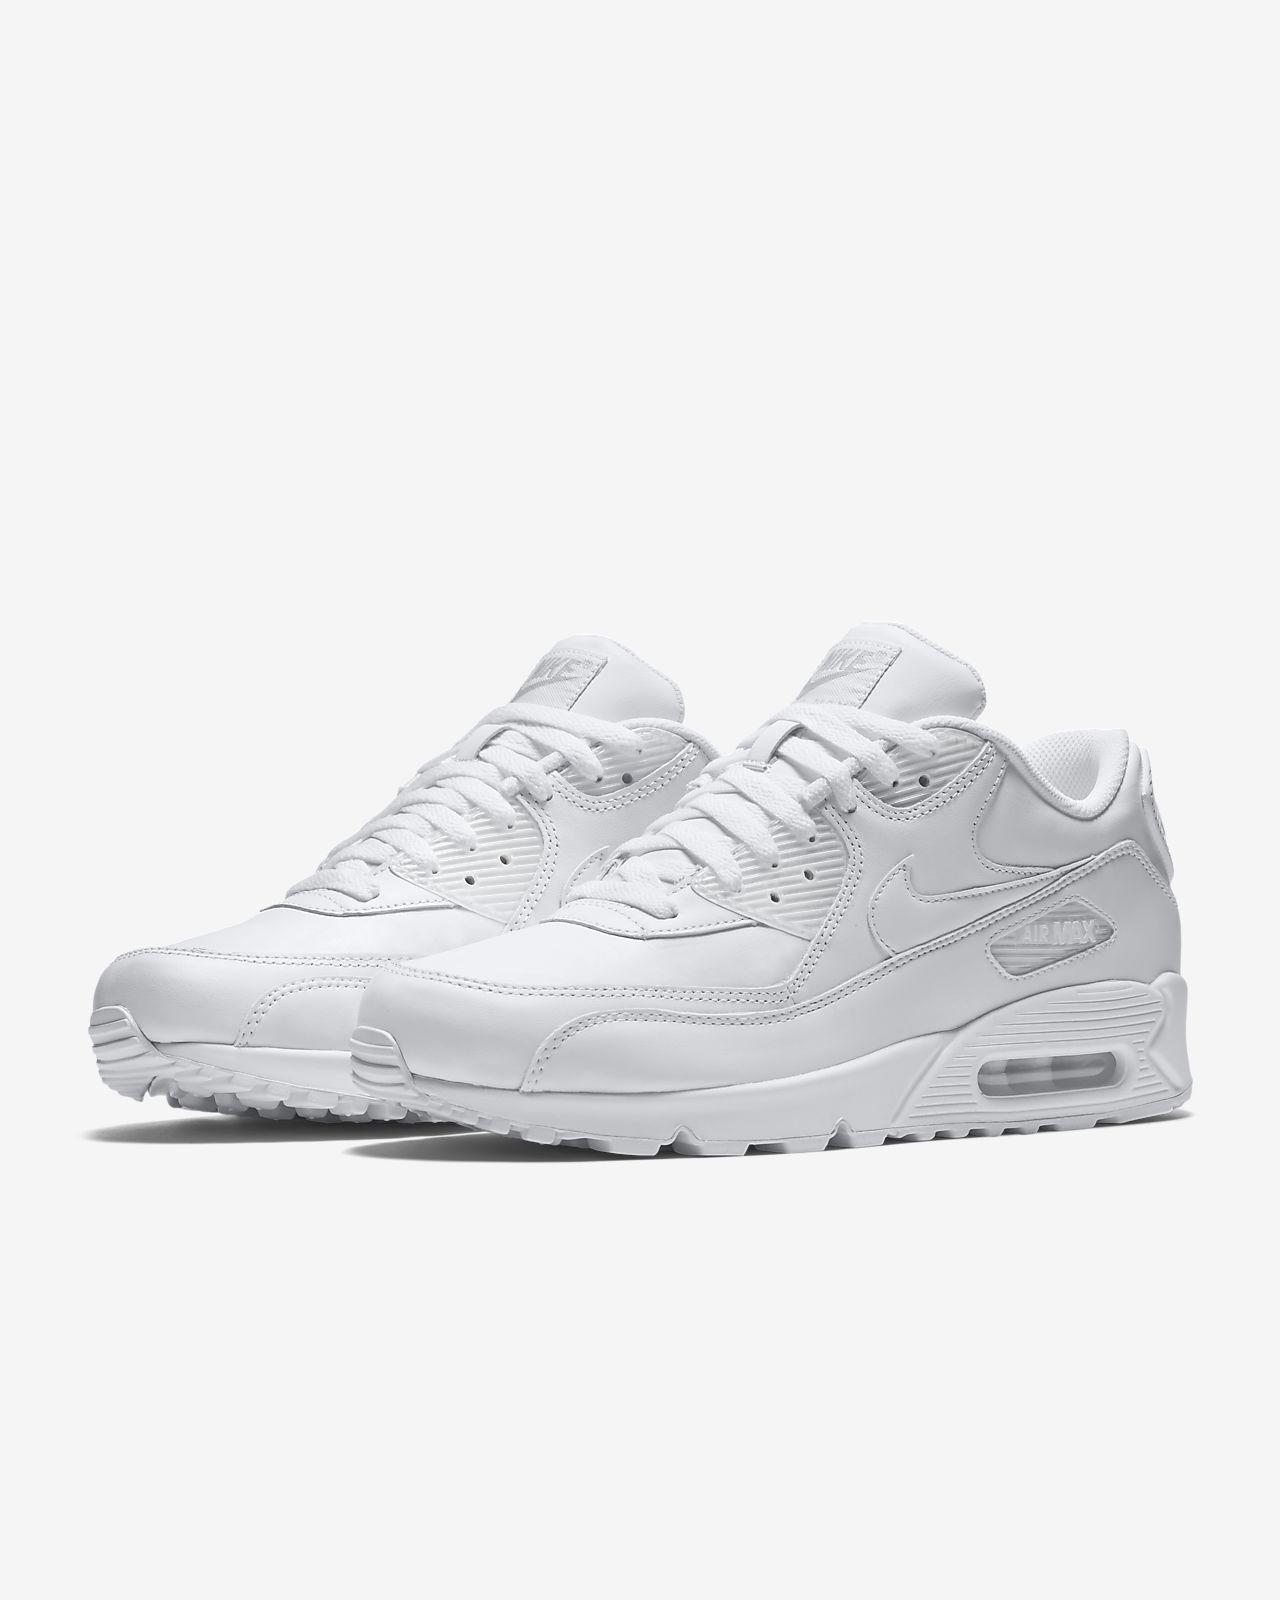 the best attitude 595fa 1d3c3 ... Nike Air Max 90 Leather Men s Shoe